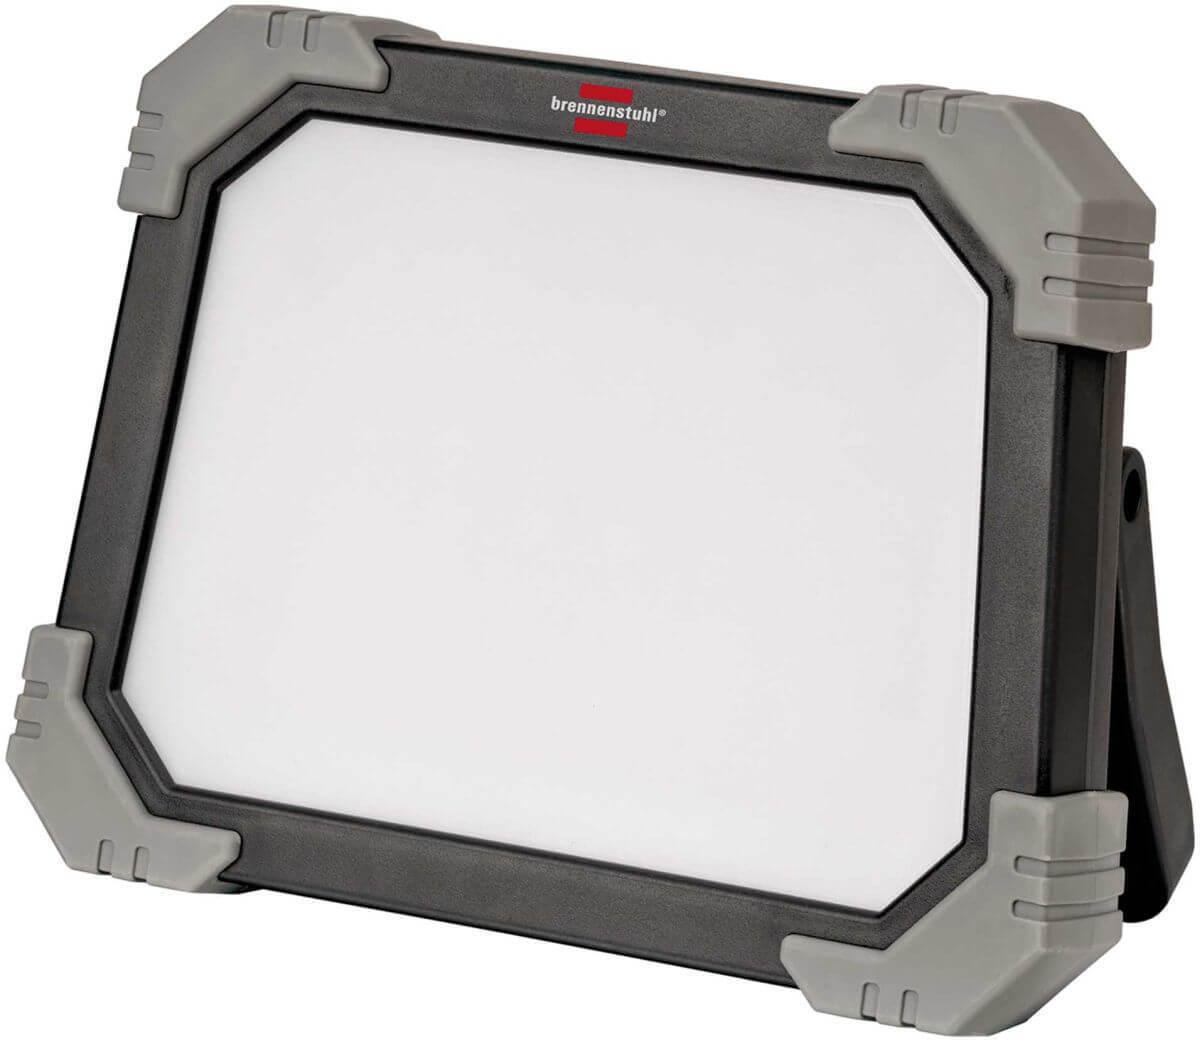 Brennenstuhl Brennenstuhl Brennenstuhl Mobiler LED Strahler DINORA IP65 LED-Leuchte Außen Baustrahler c419f2